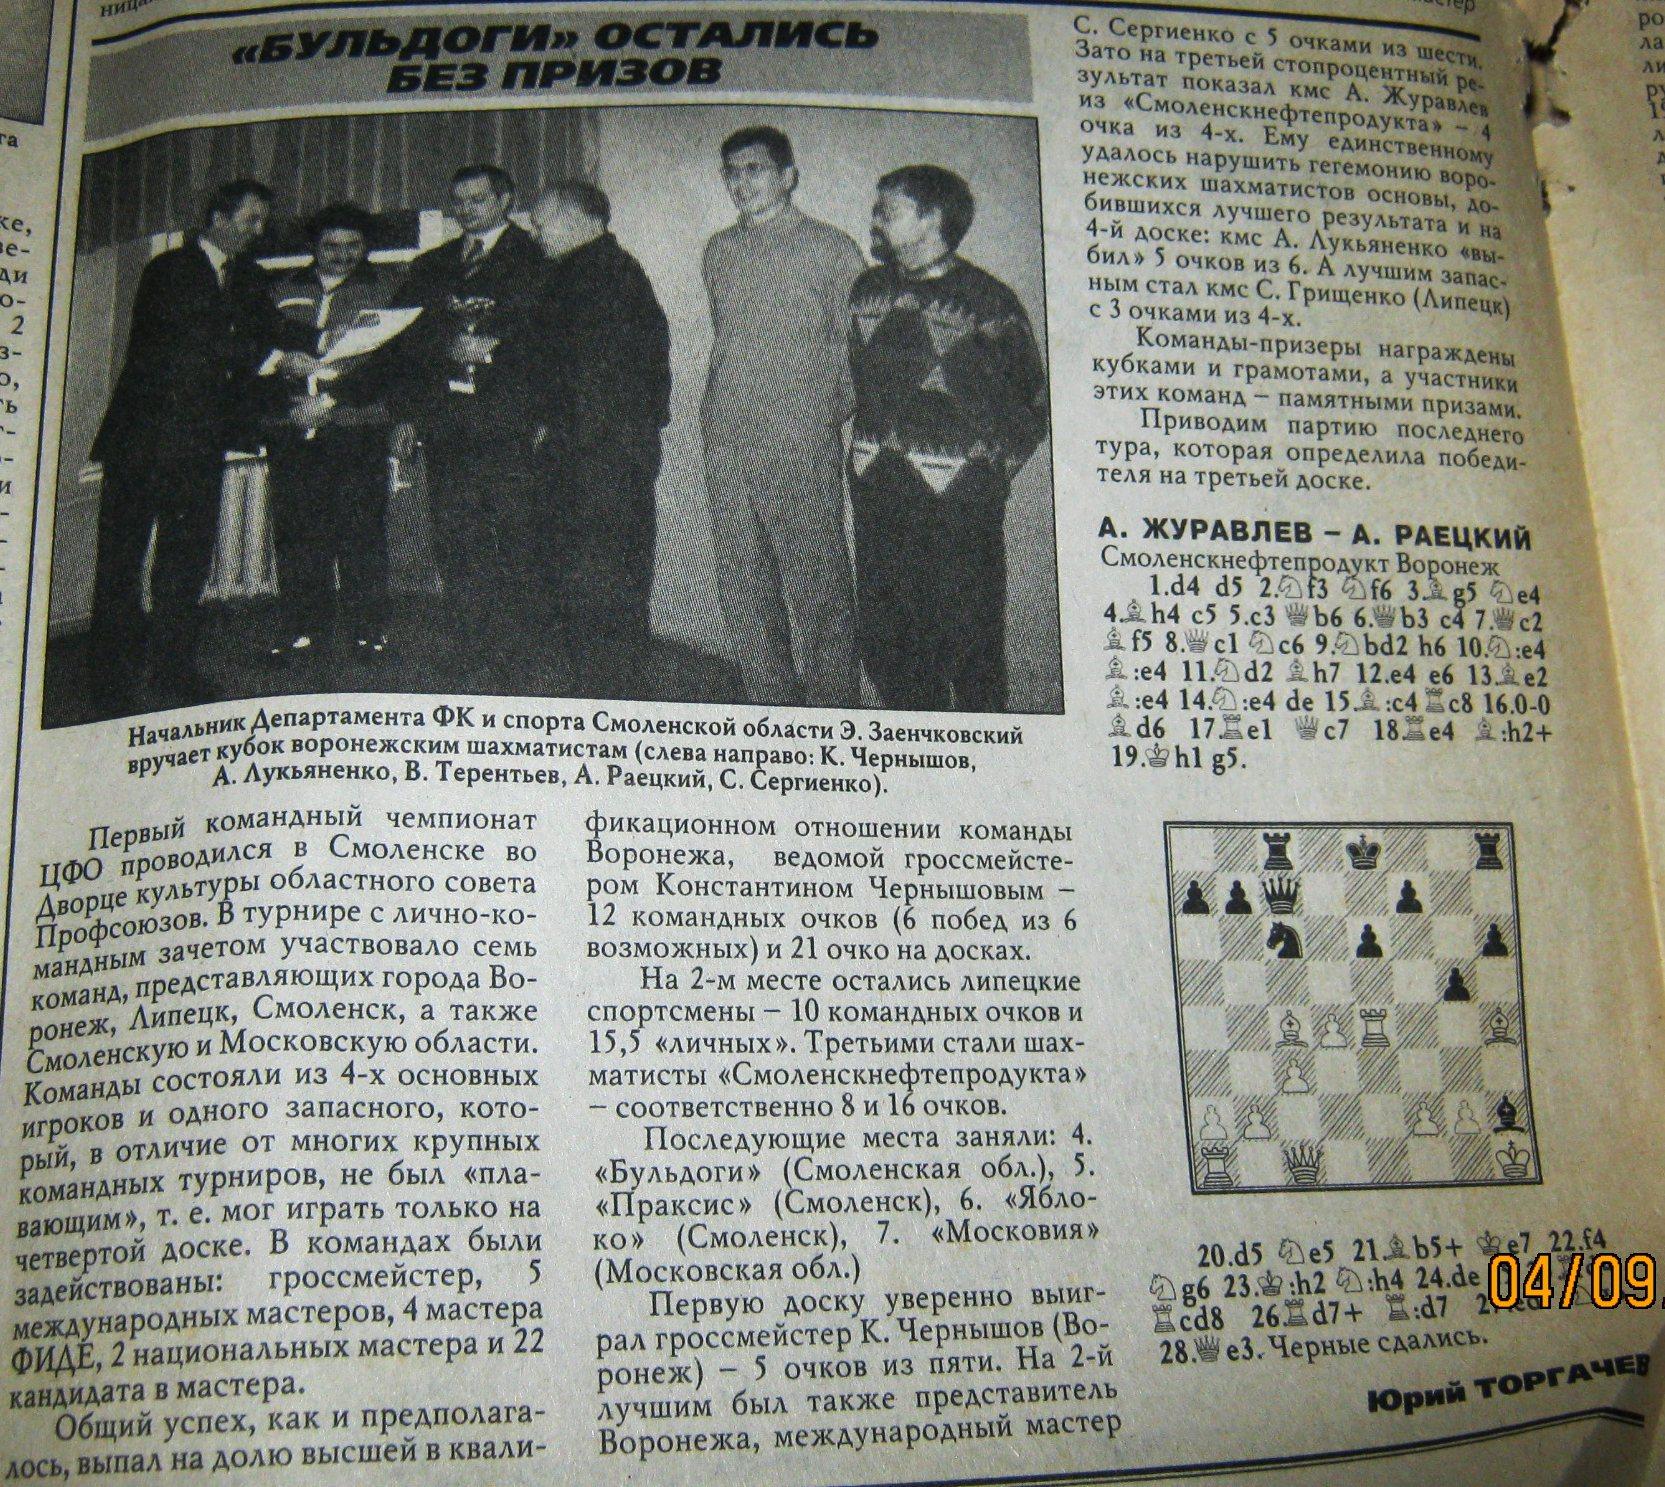 http://img-fotki.yandex.ru/get/5801/236155452.0/0_1351af_a6c2b4d5_orig.jpg